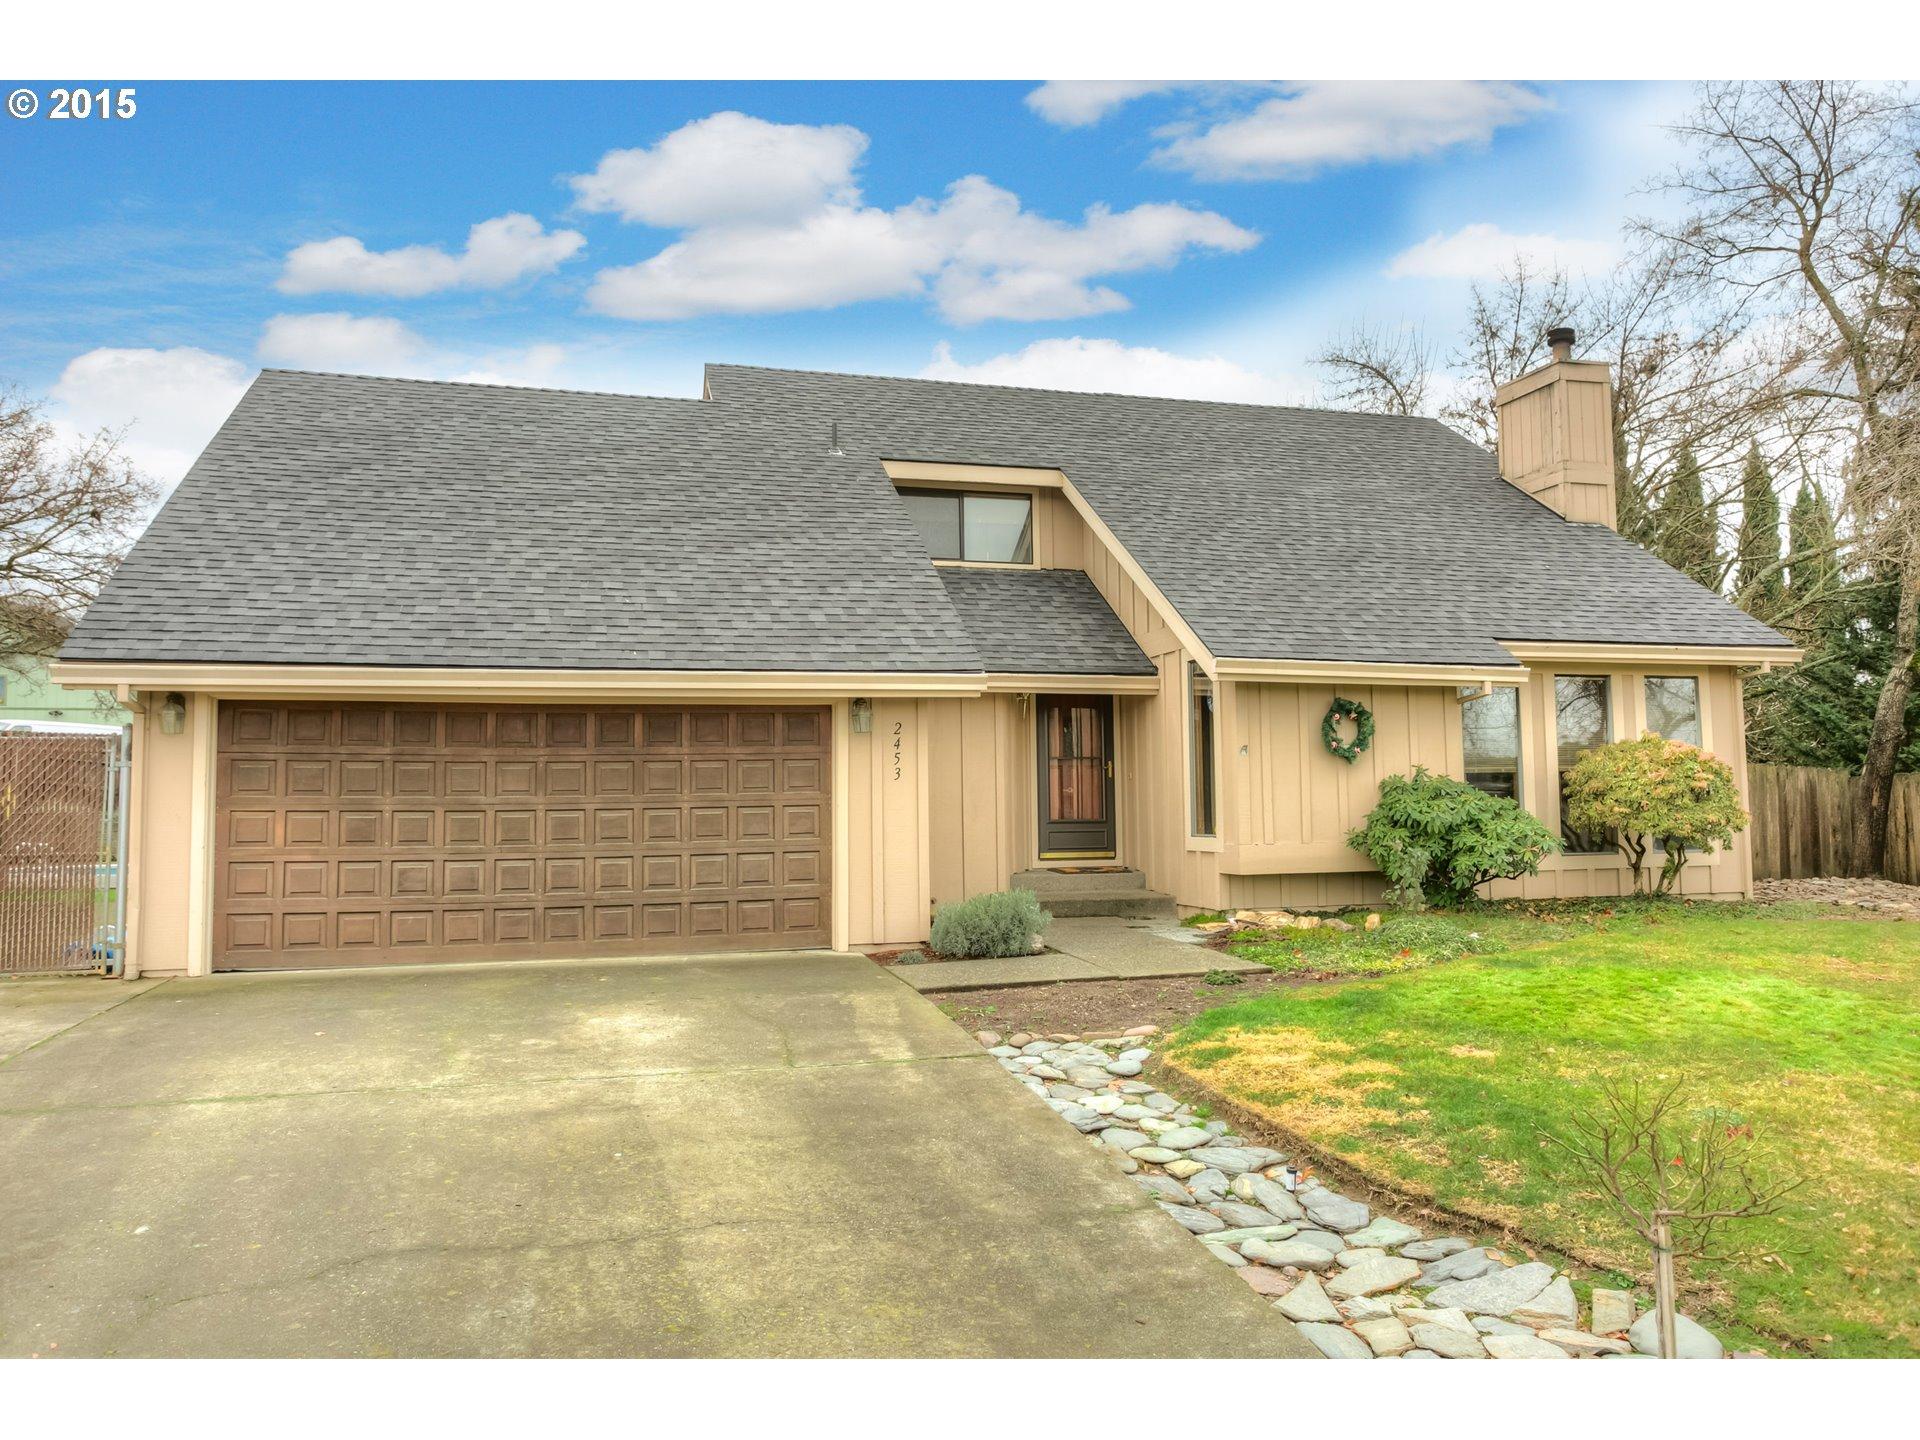 2453 Huntington Ln, Medford, OR